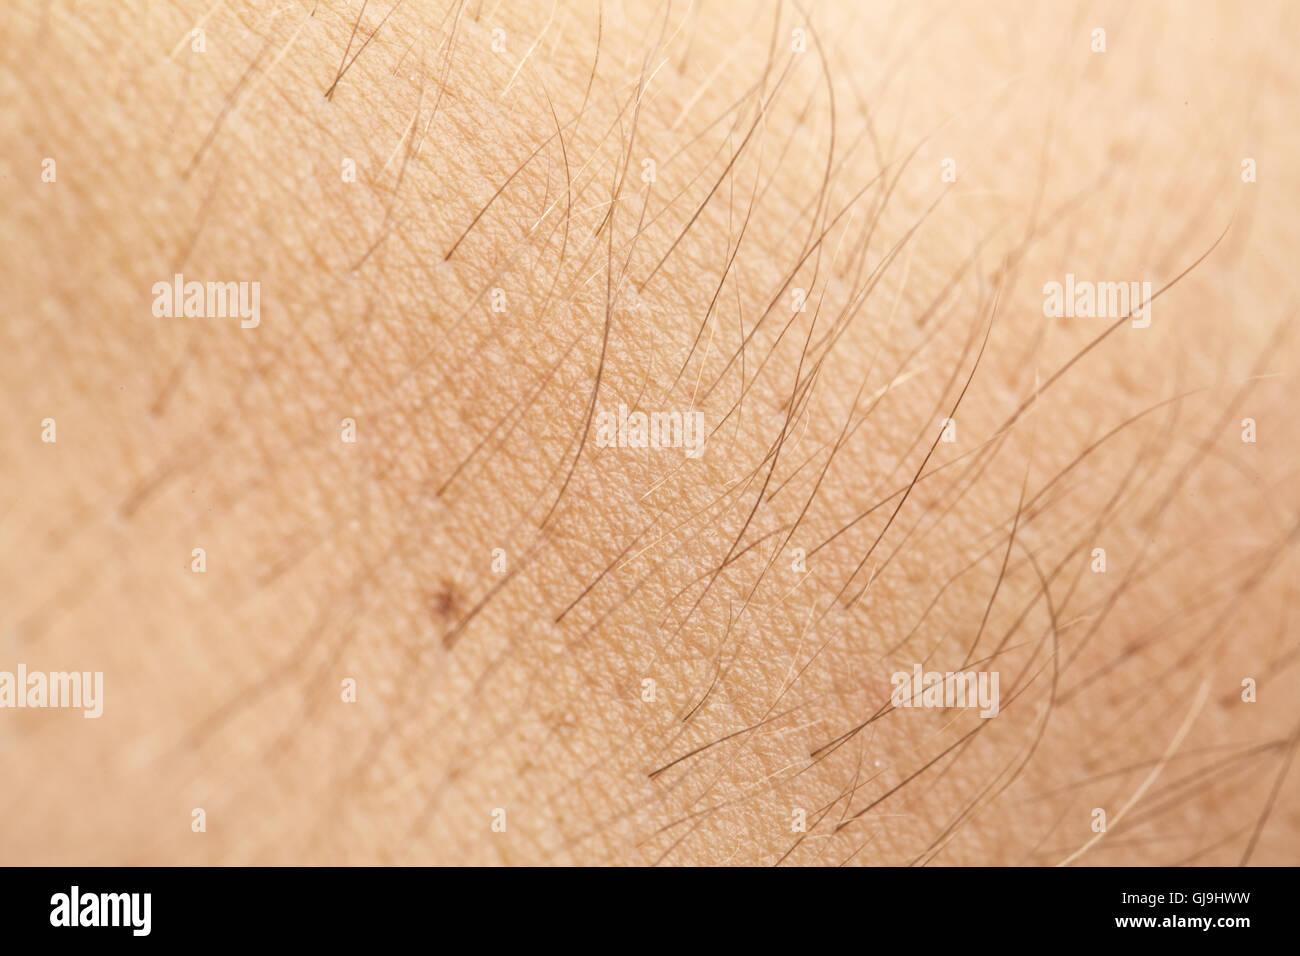 Male Skin closeup - Stock Image